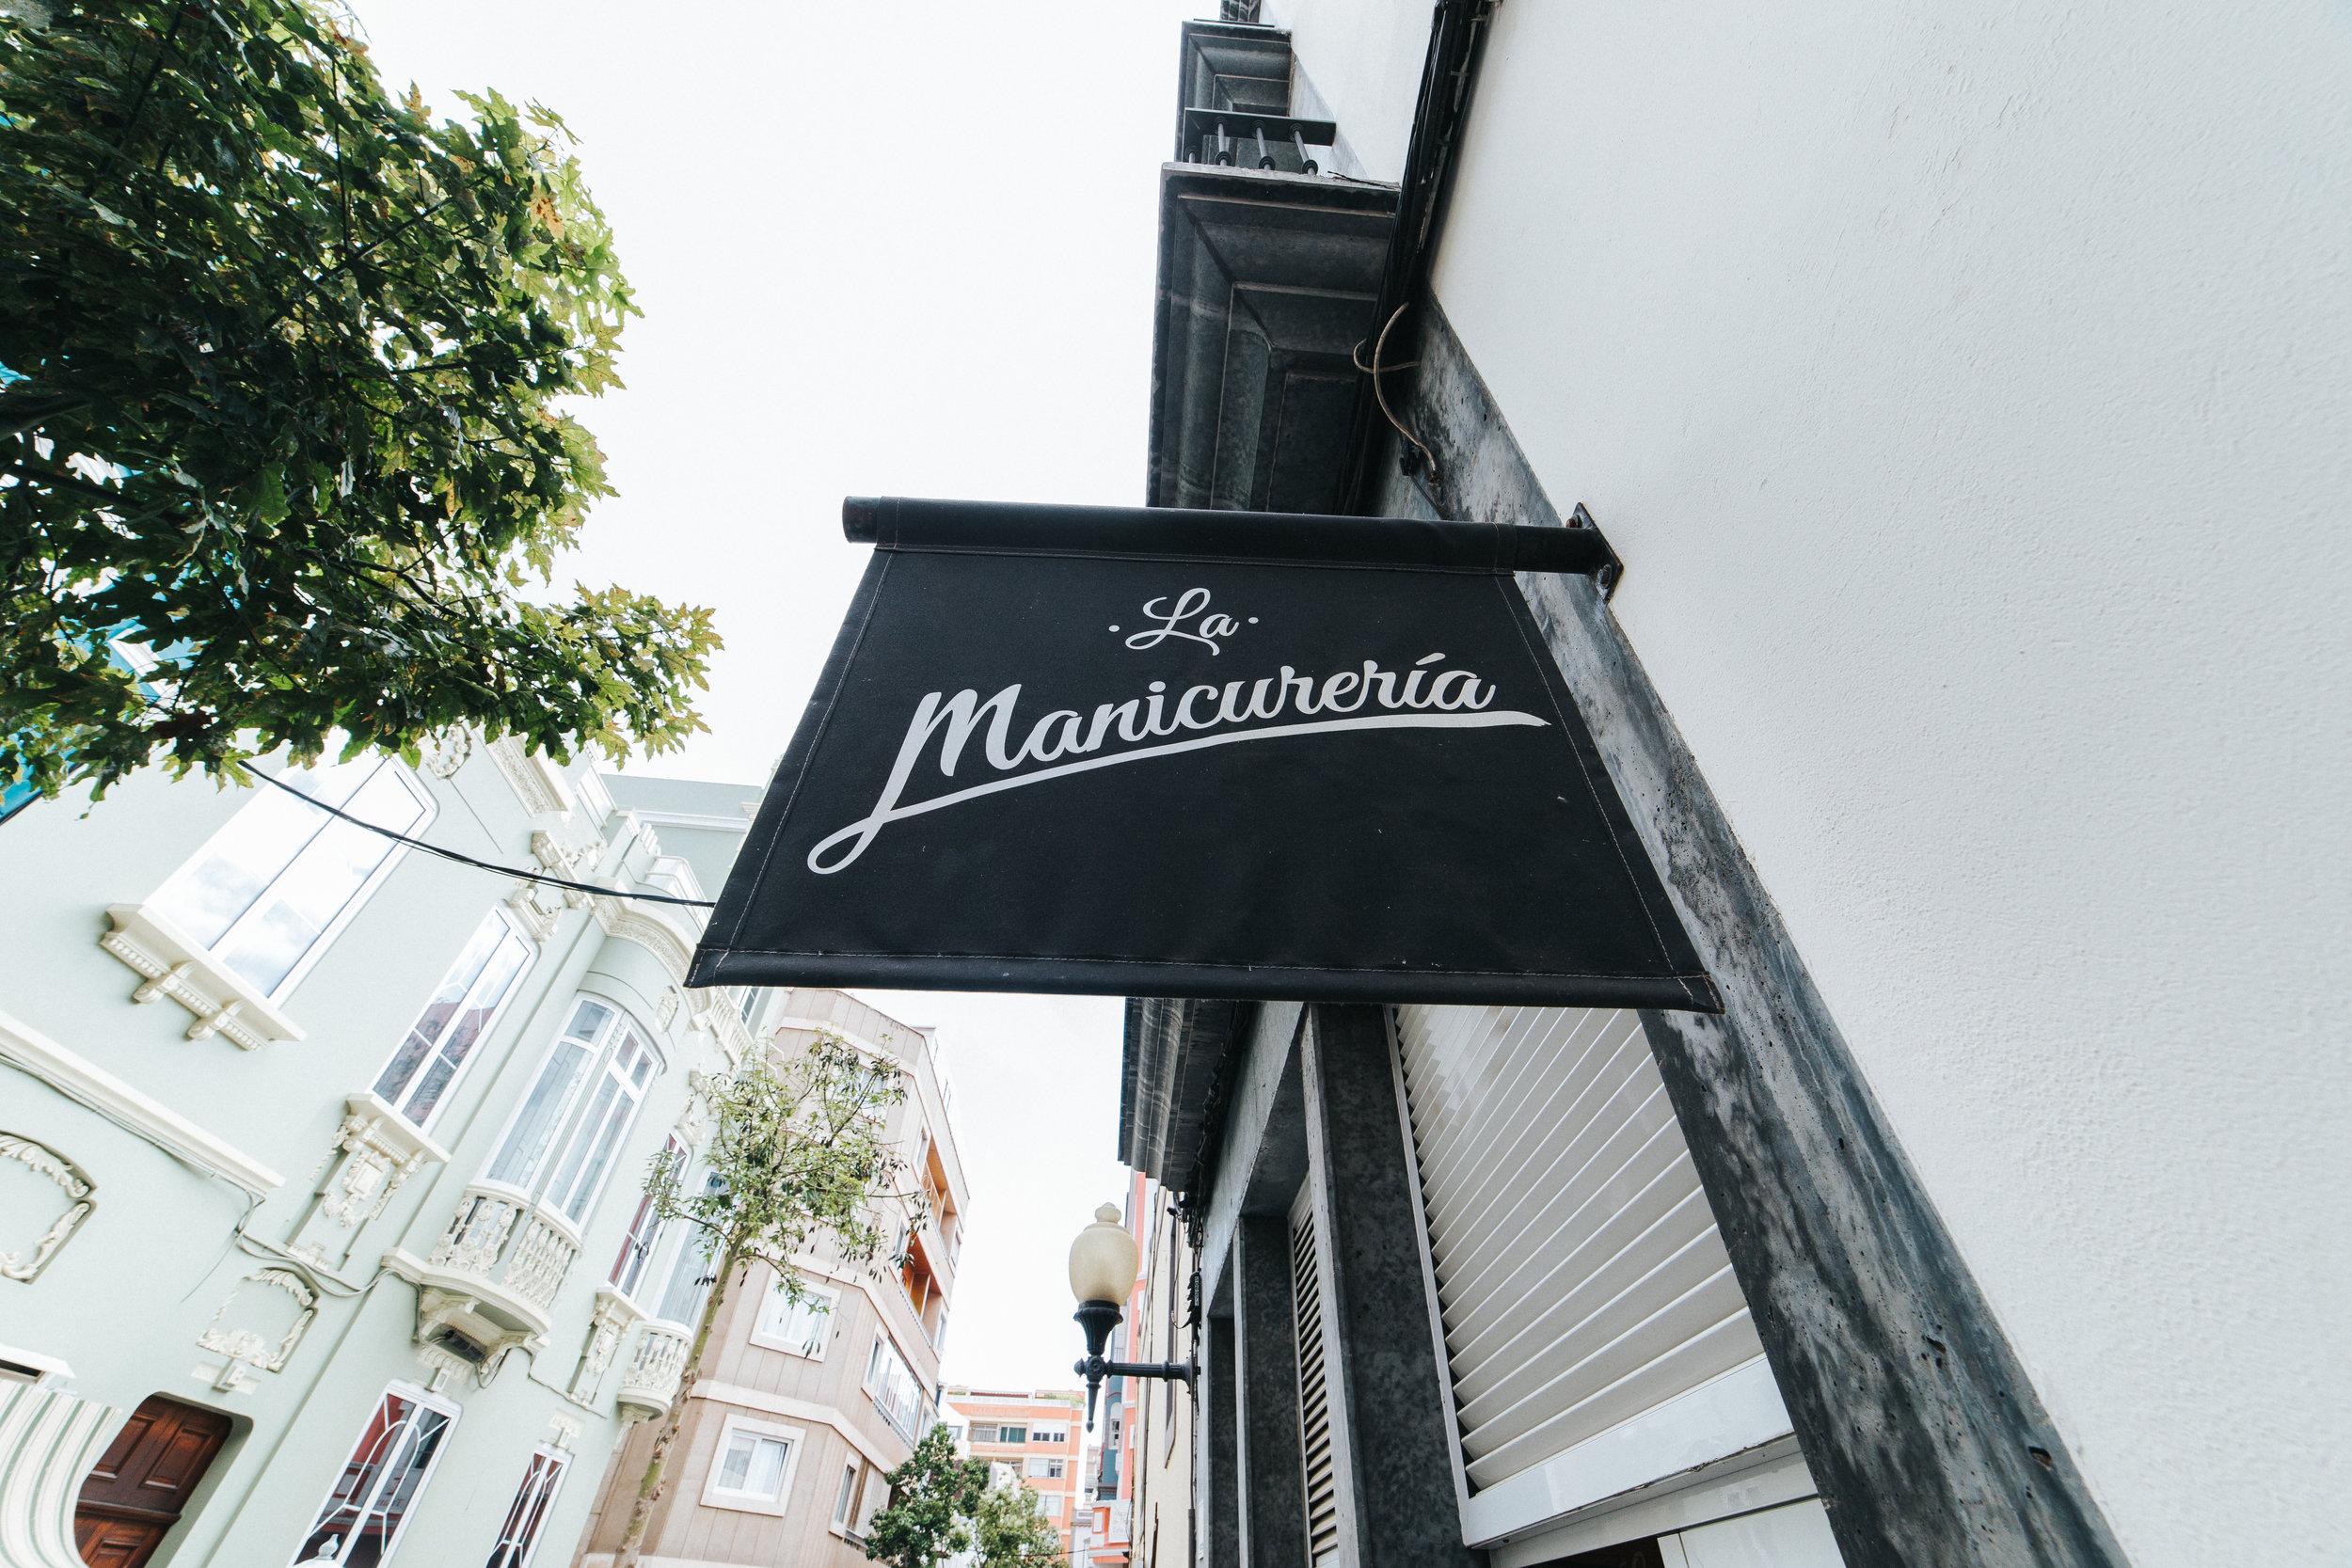 The-Office-La-Manicurería-Travieso19-5.jpg